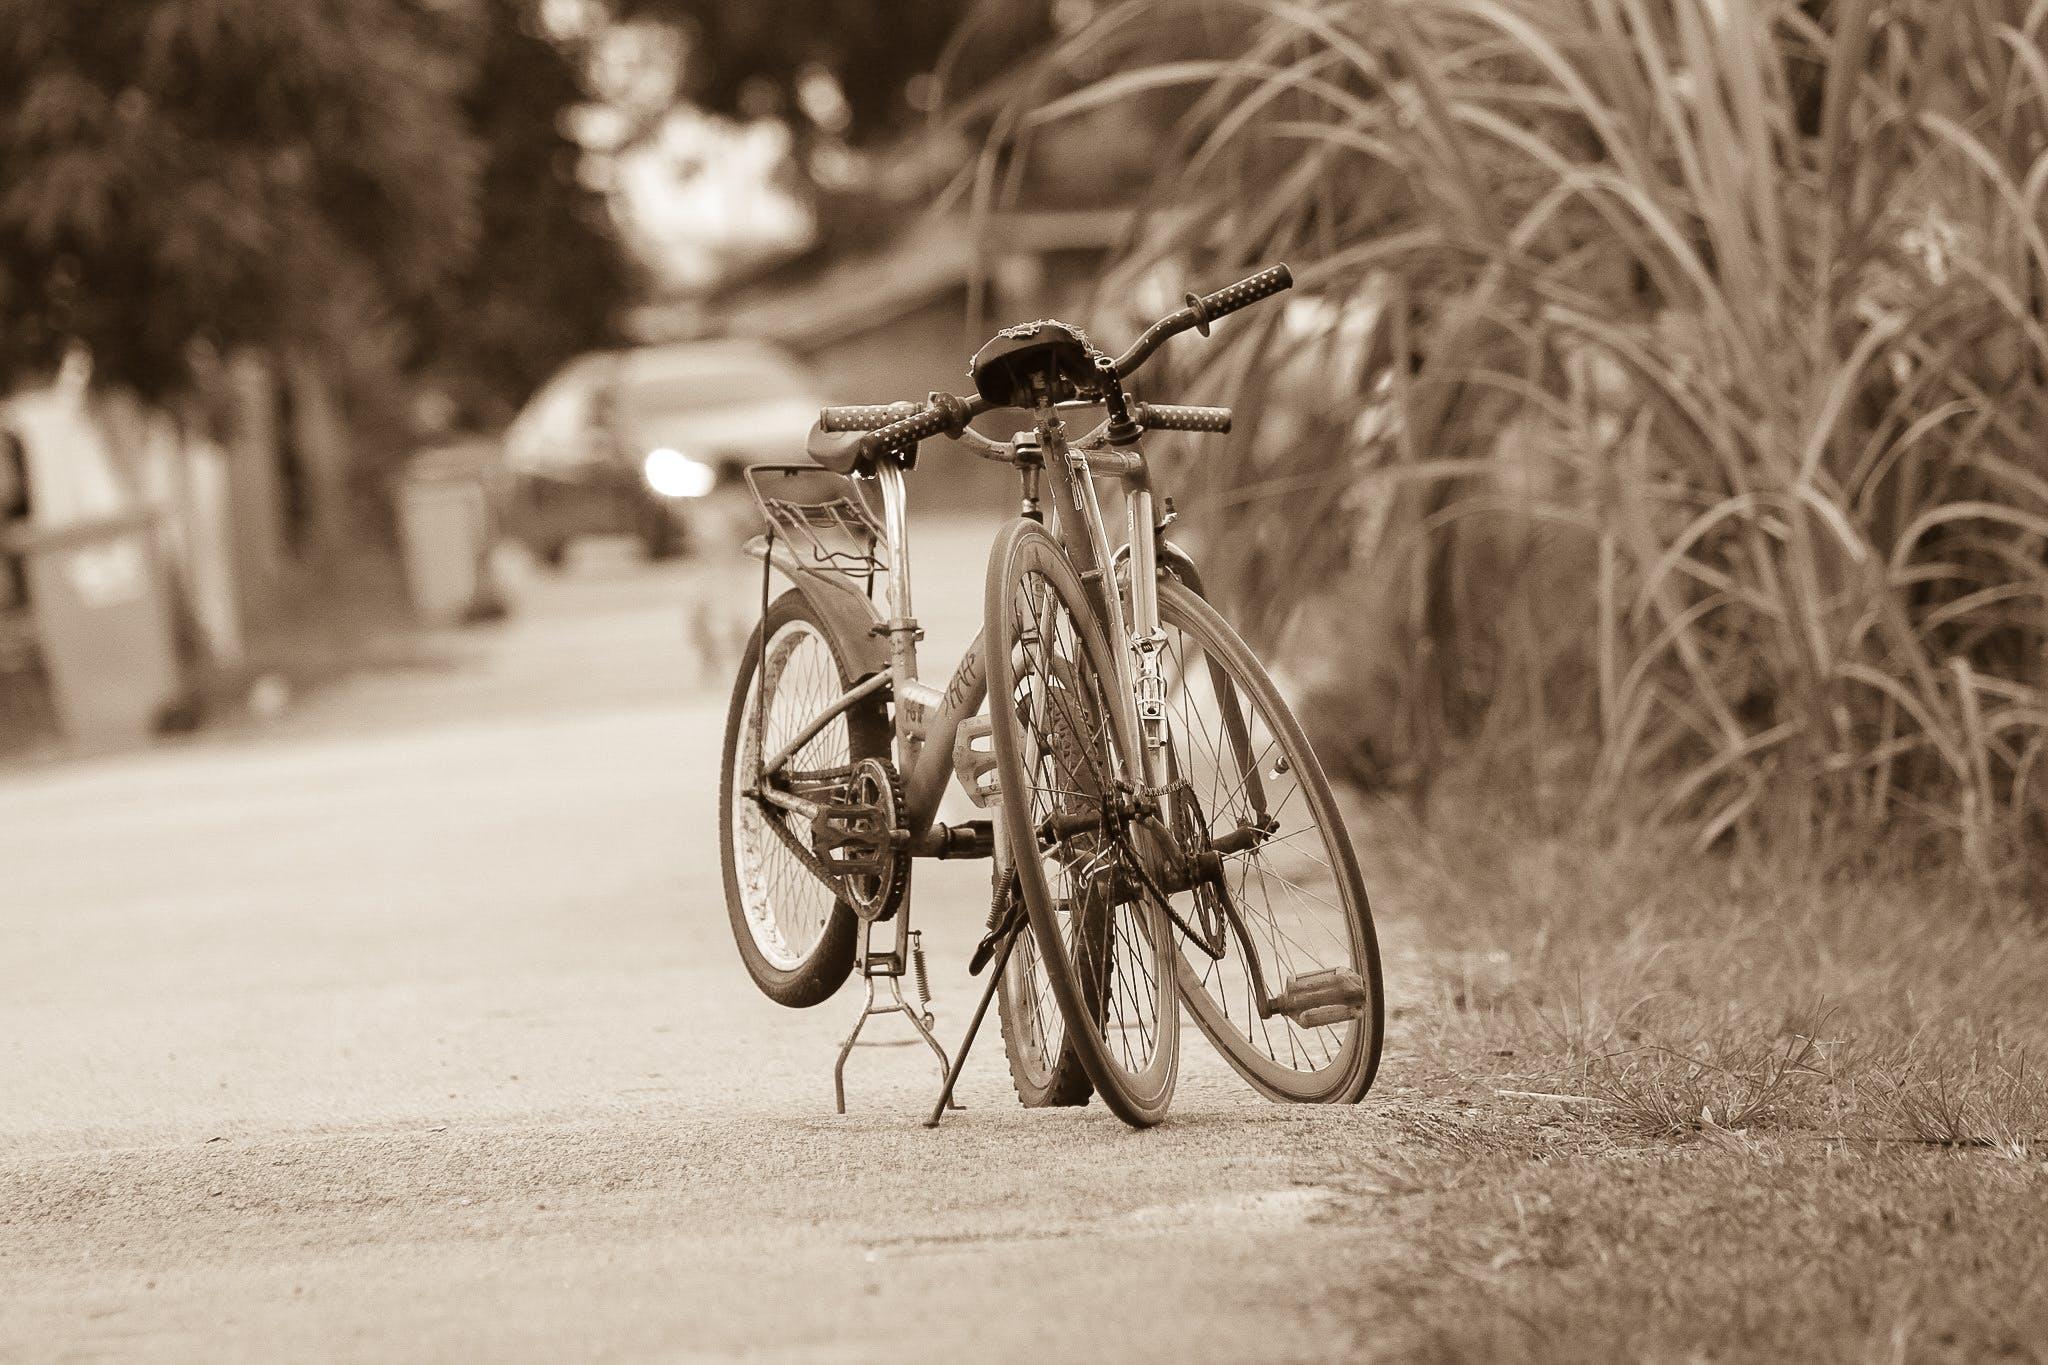 Gratis lagerfoto af bane, bil, cykel, gade